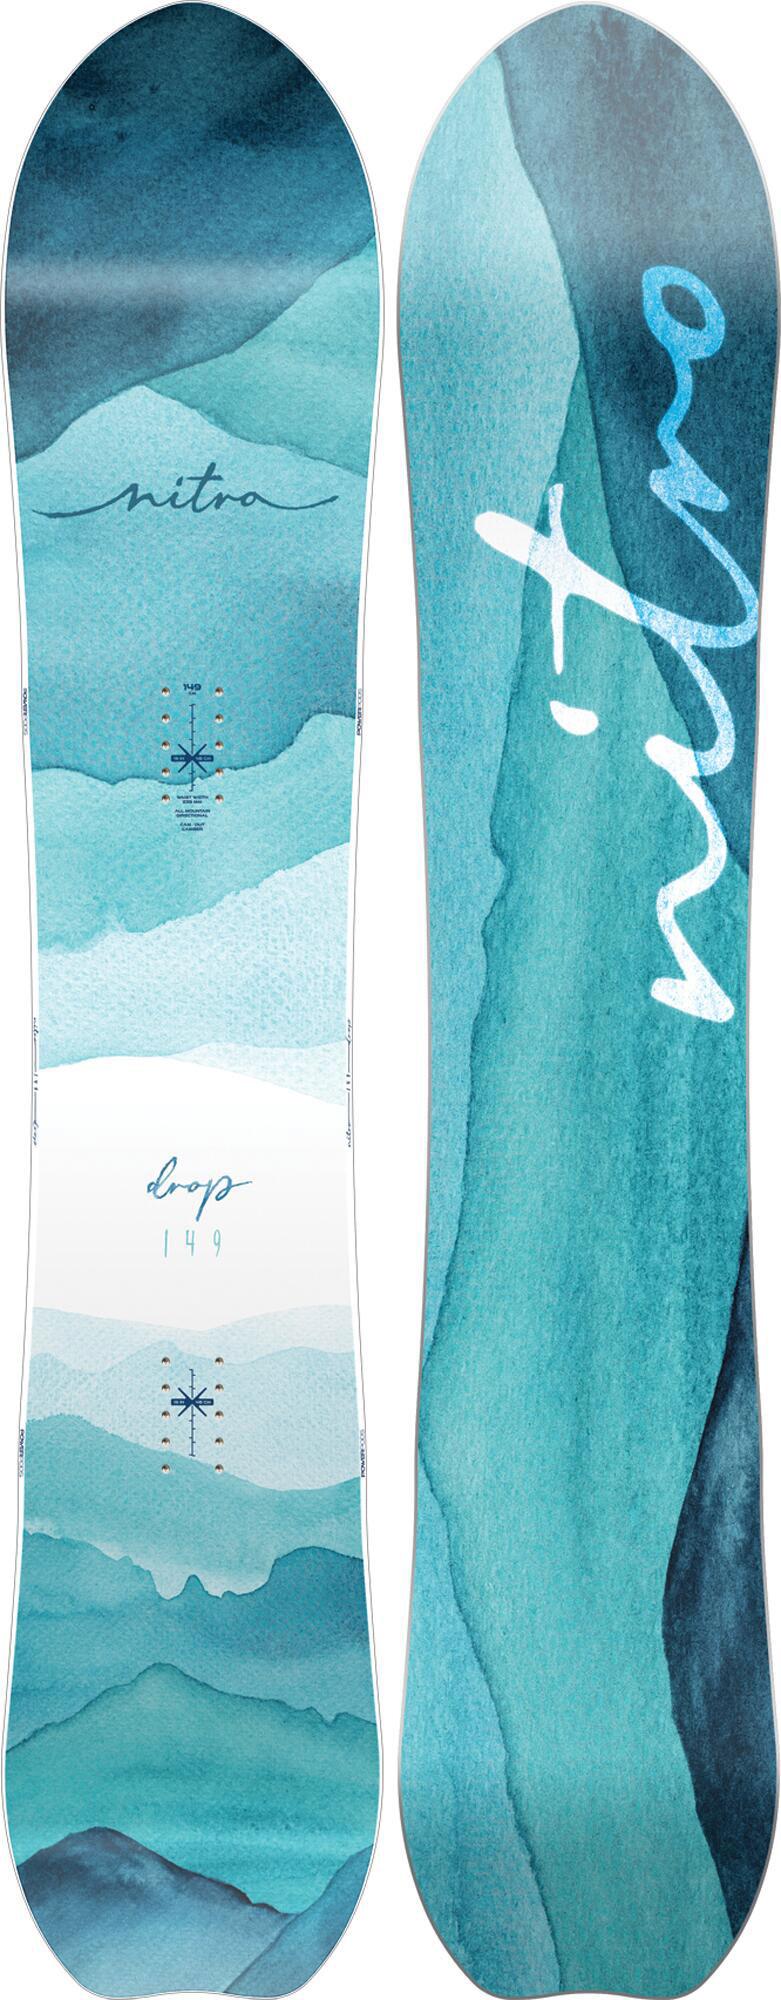 Nitro Drop Women S Snowboard Review 2019